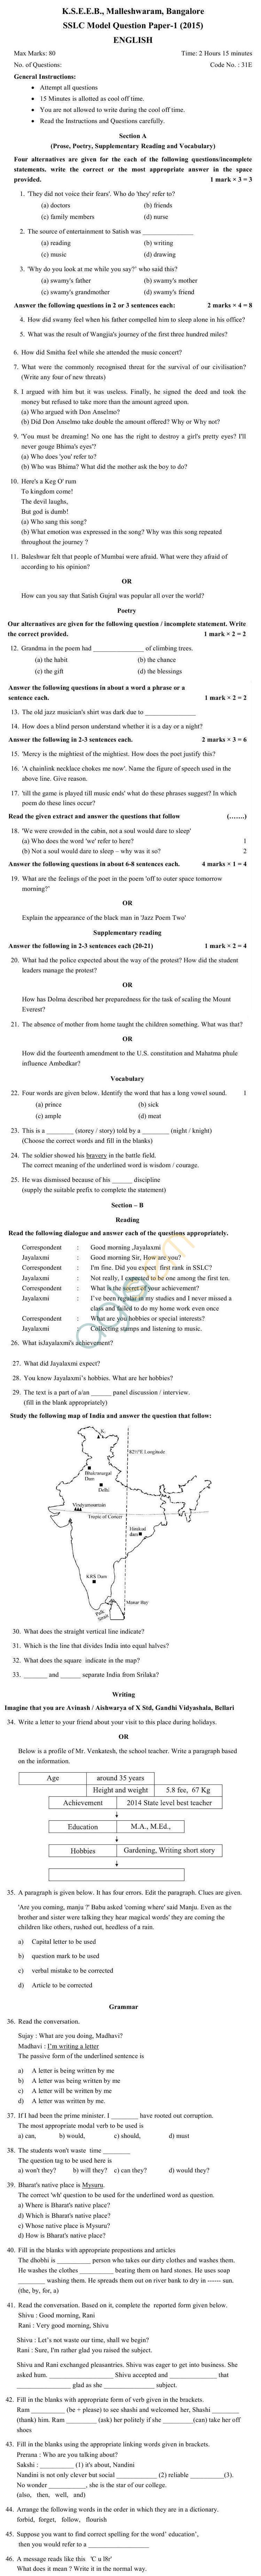 Karnataka Board SSLC Model Question Papers 2015 forEnglish (II)